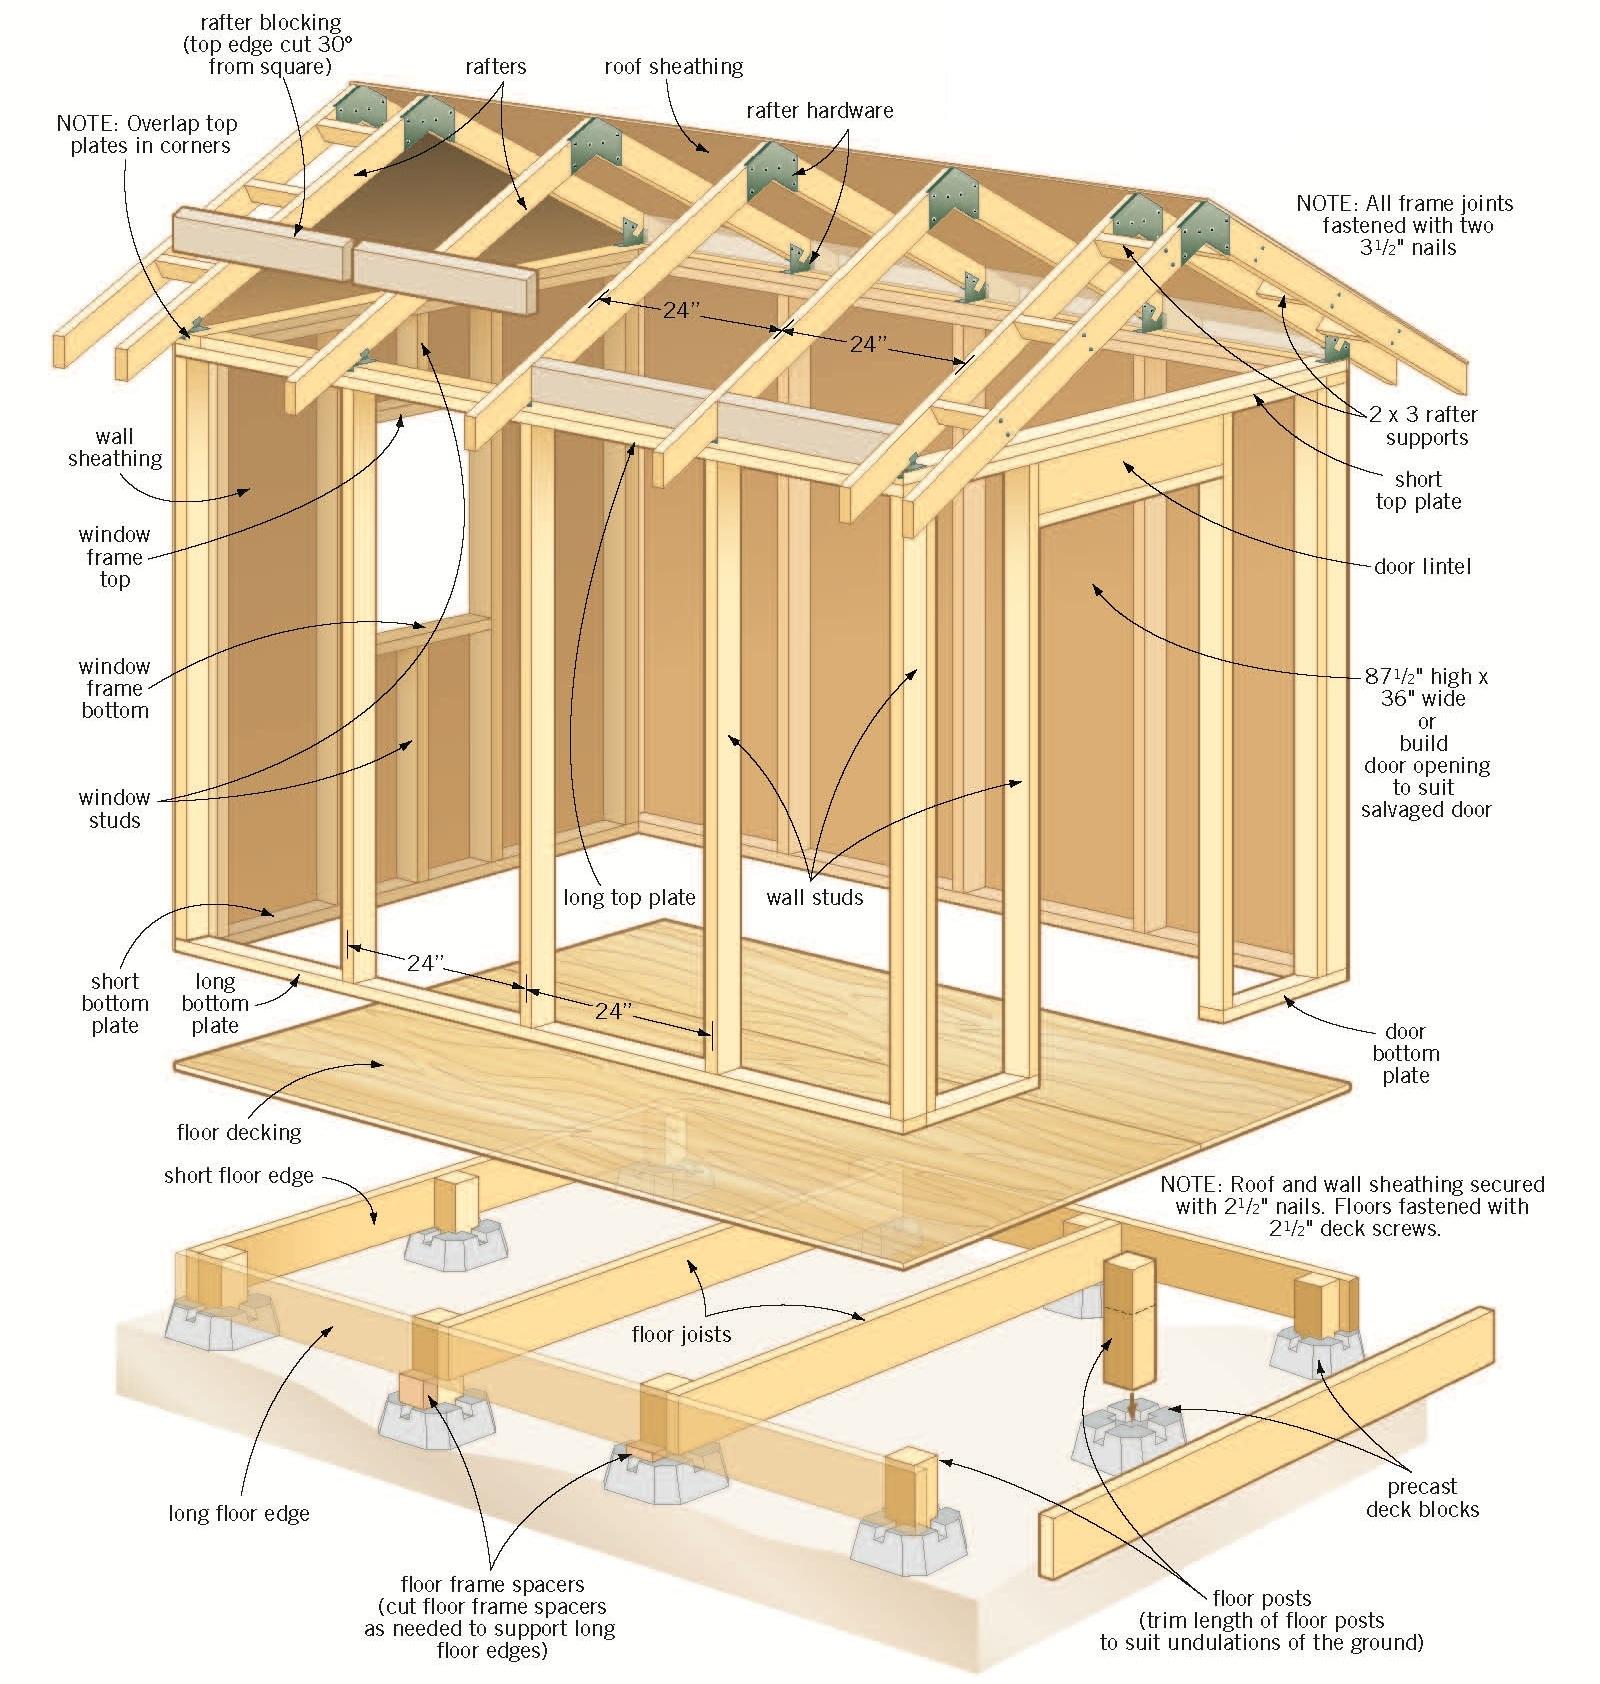 backyard sheds designs photo - 1